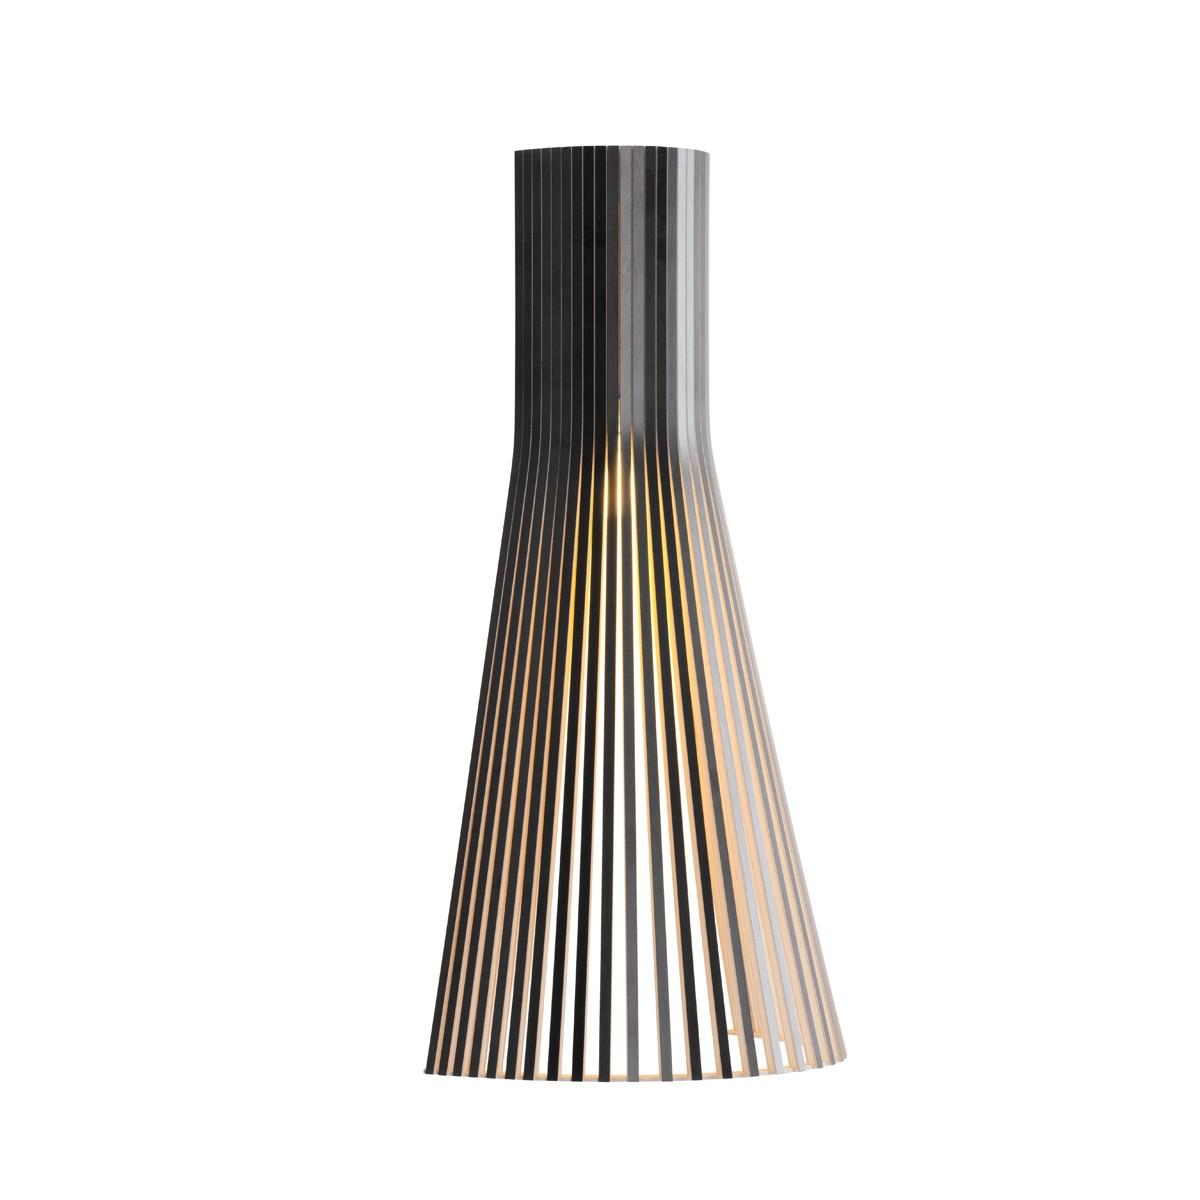 Secto Design Secto 4230 Wandleuchte, schwarz laminiert